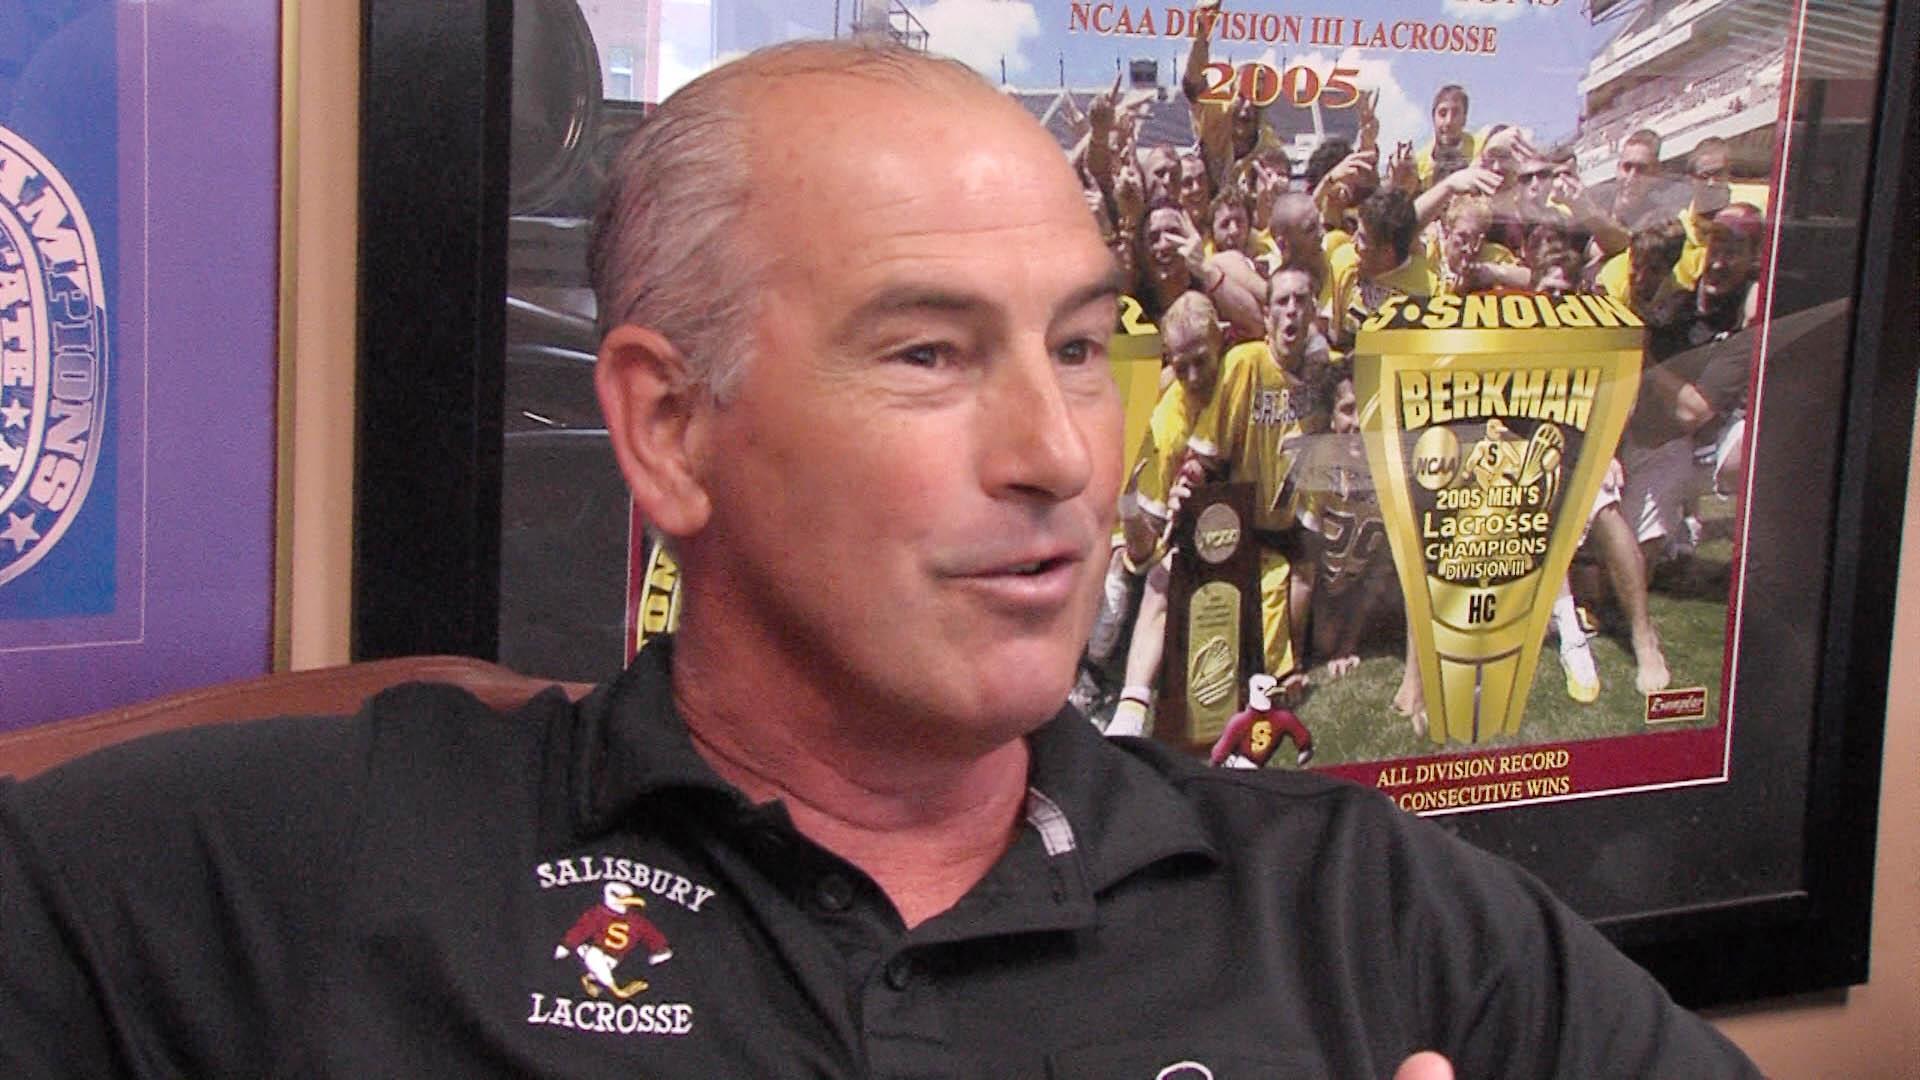 Milestone for SU Men's Lacrosse Head Coach Berkman: 500th Career Win